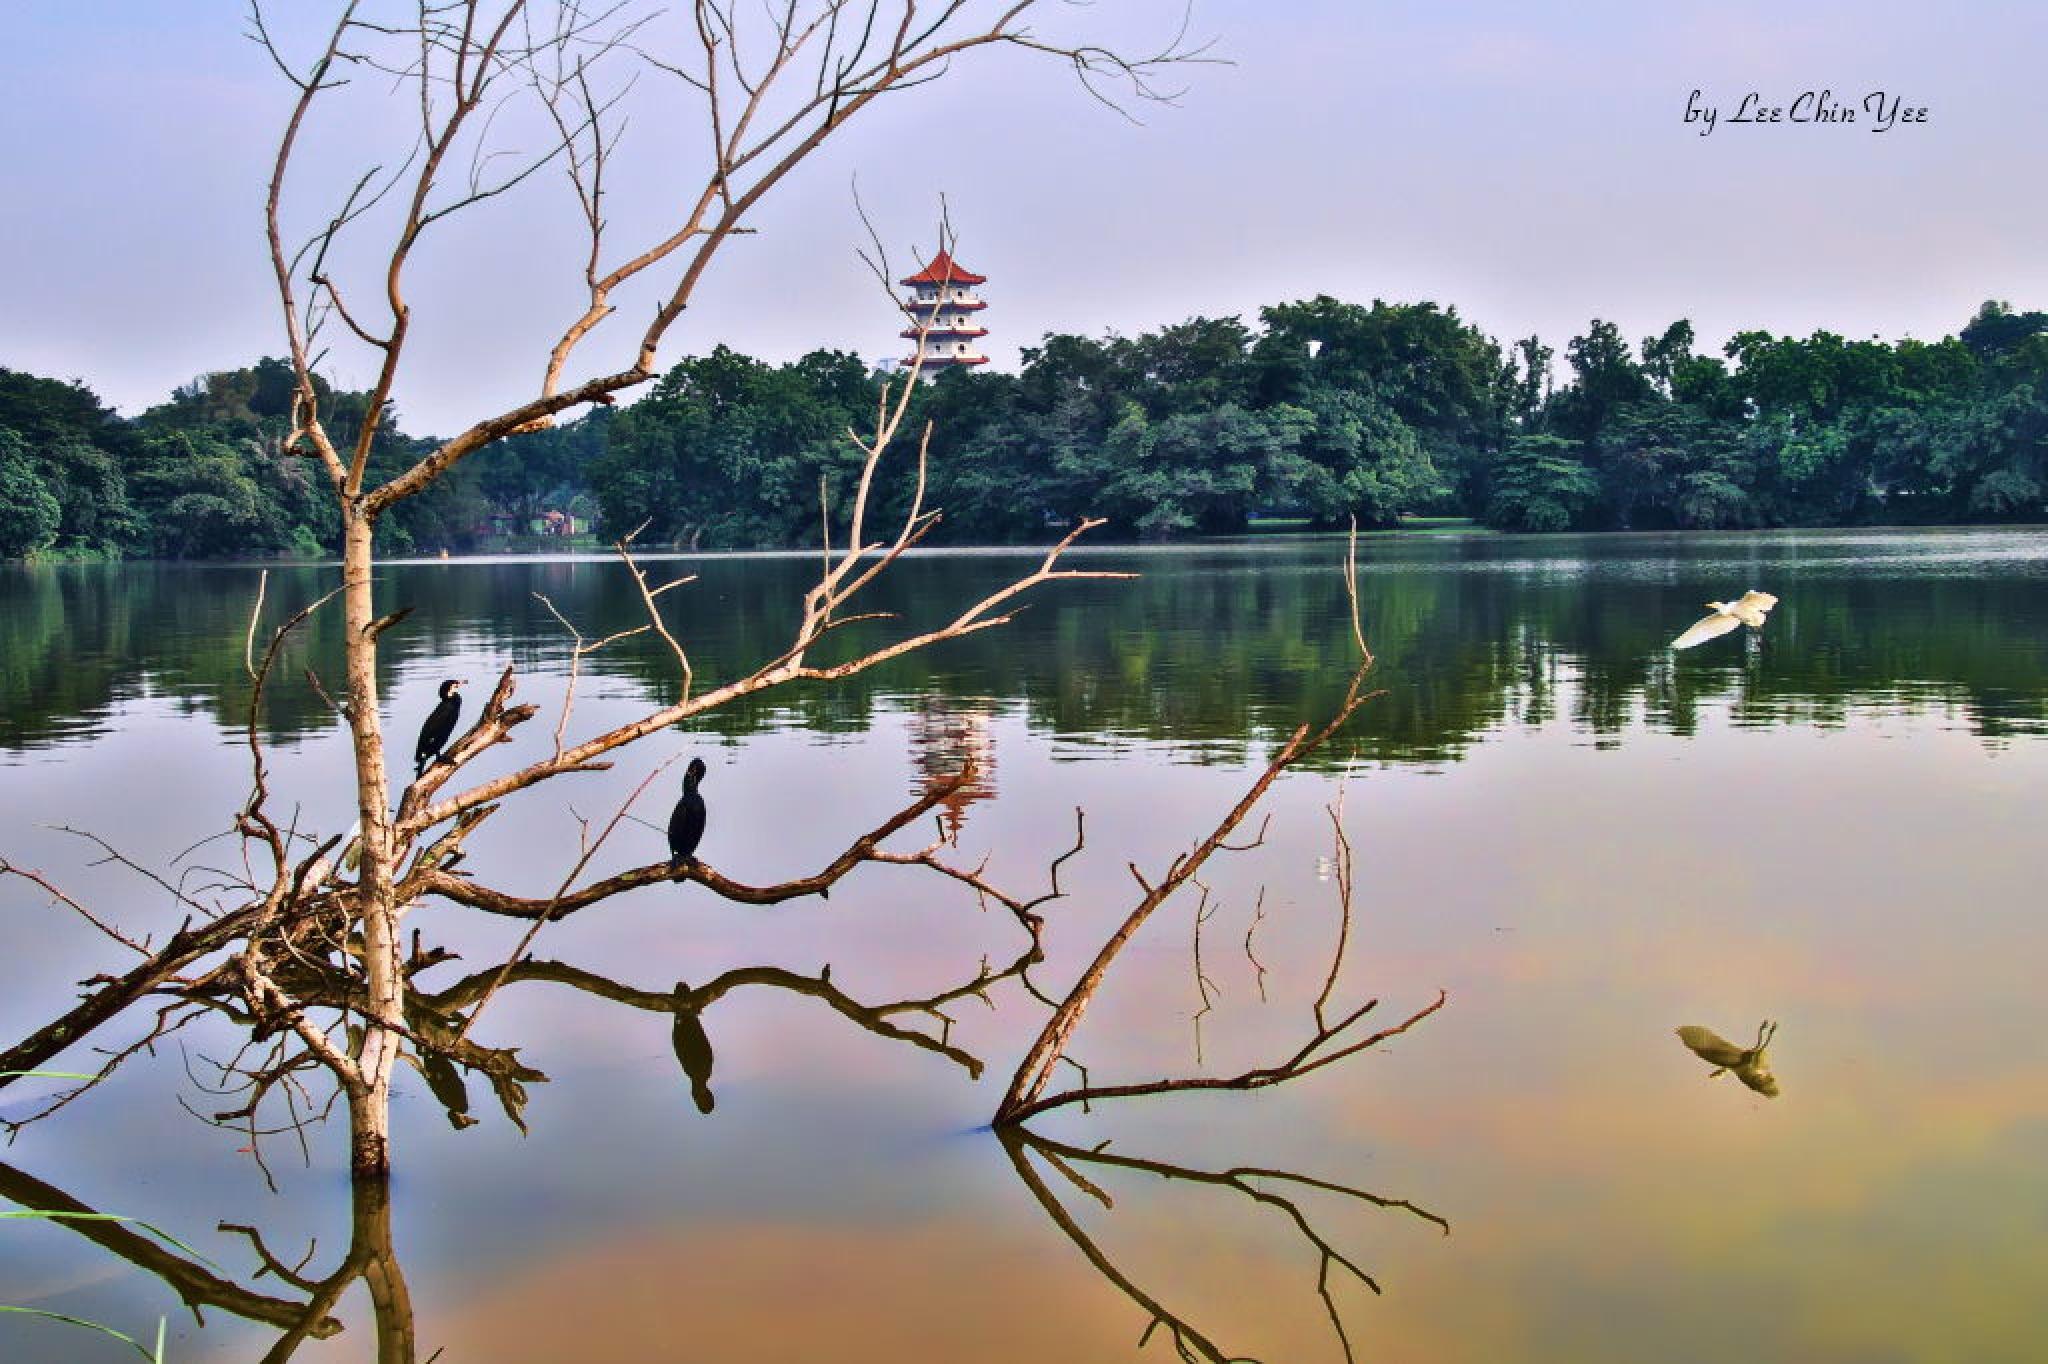 Jurong Lake by Chinyee